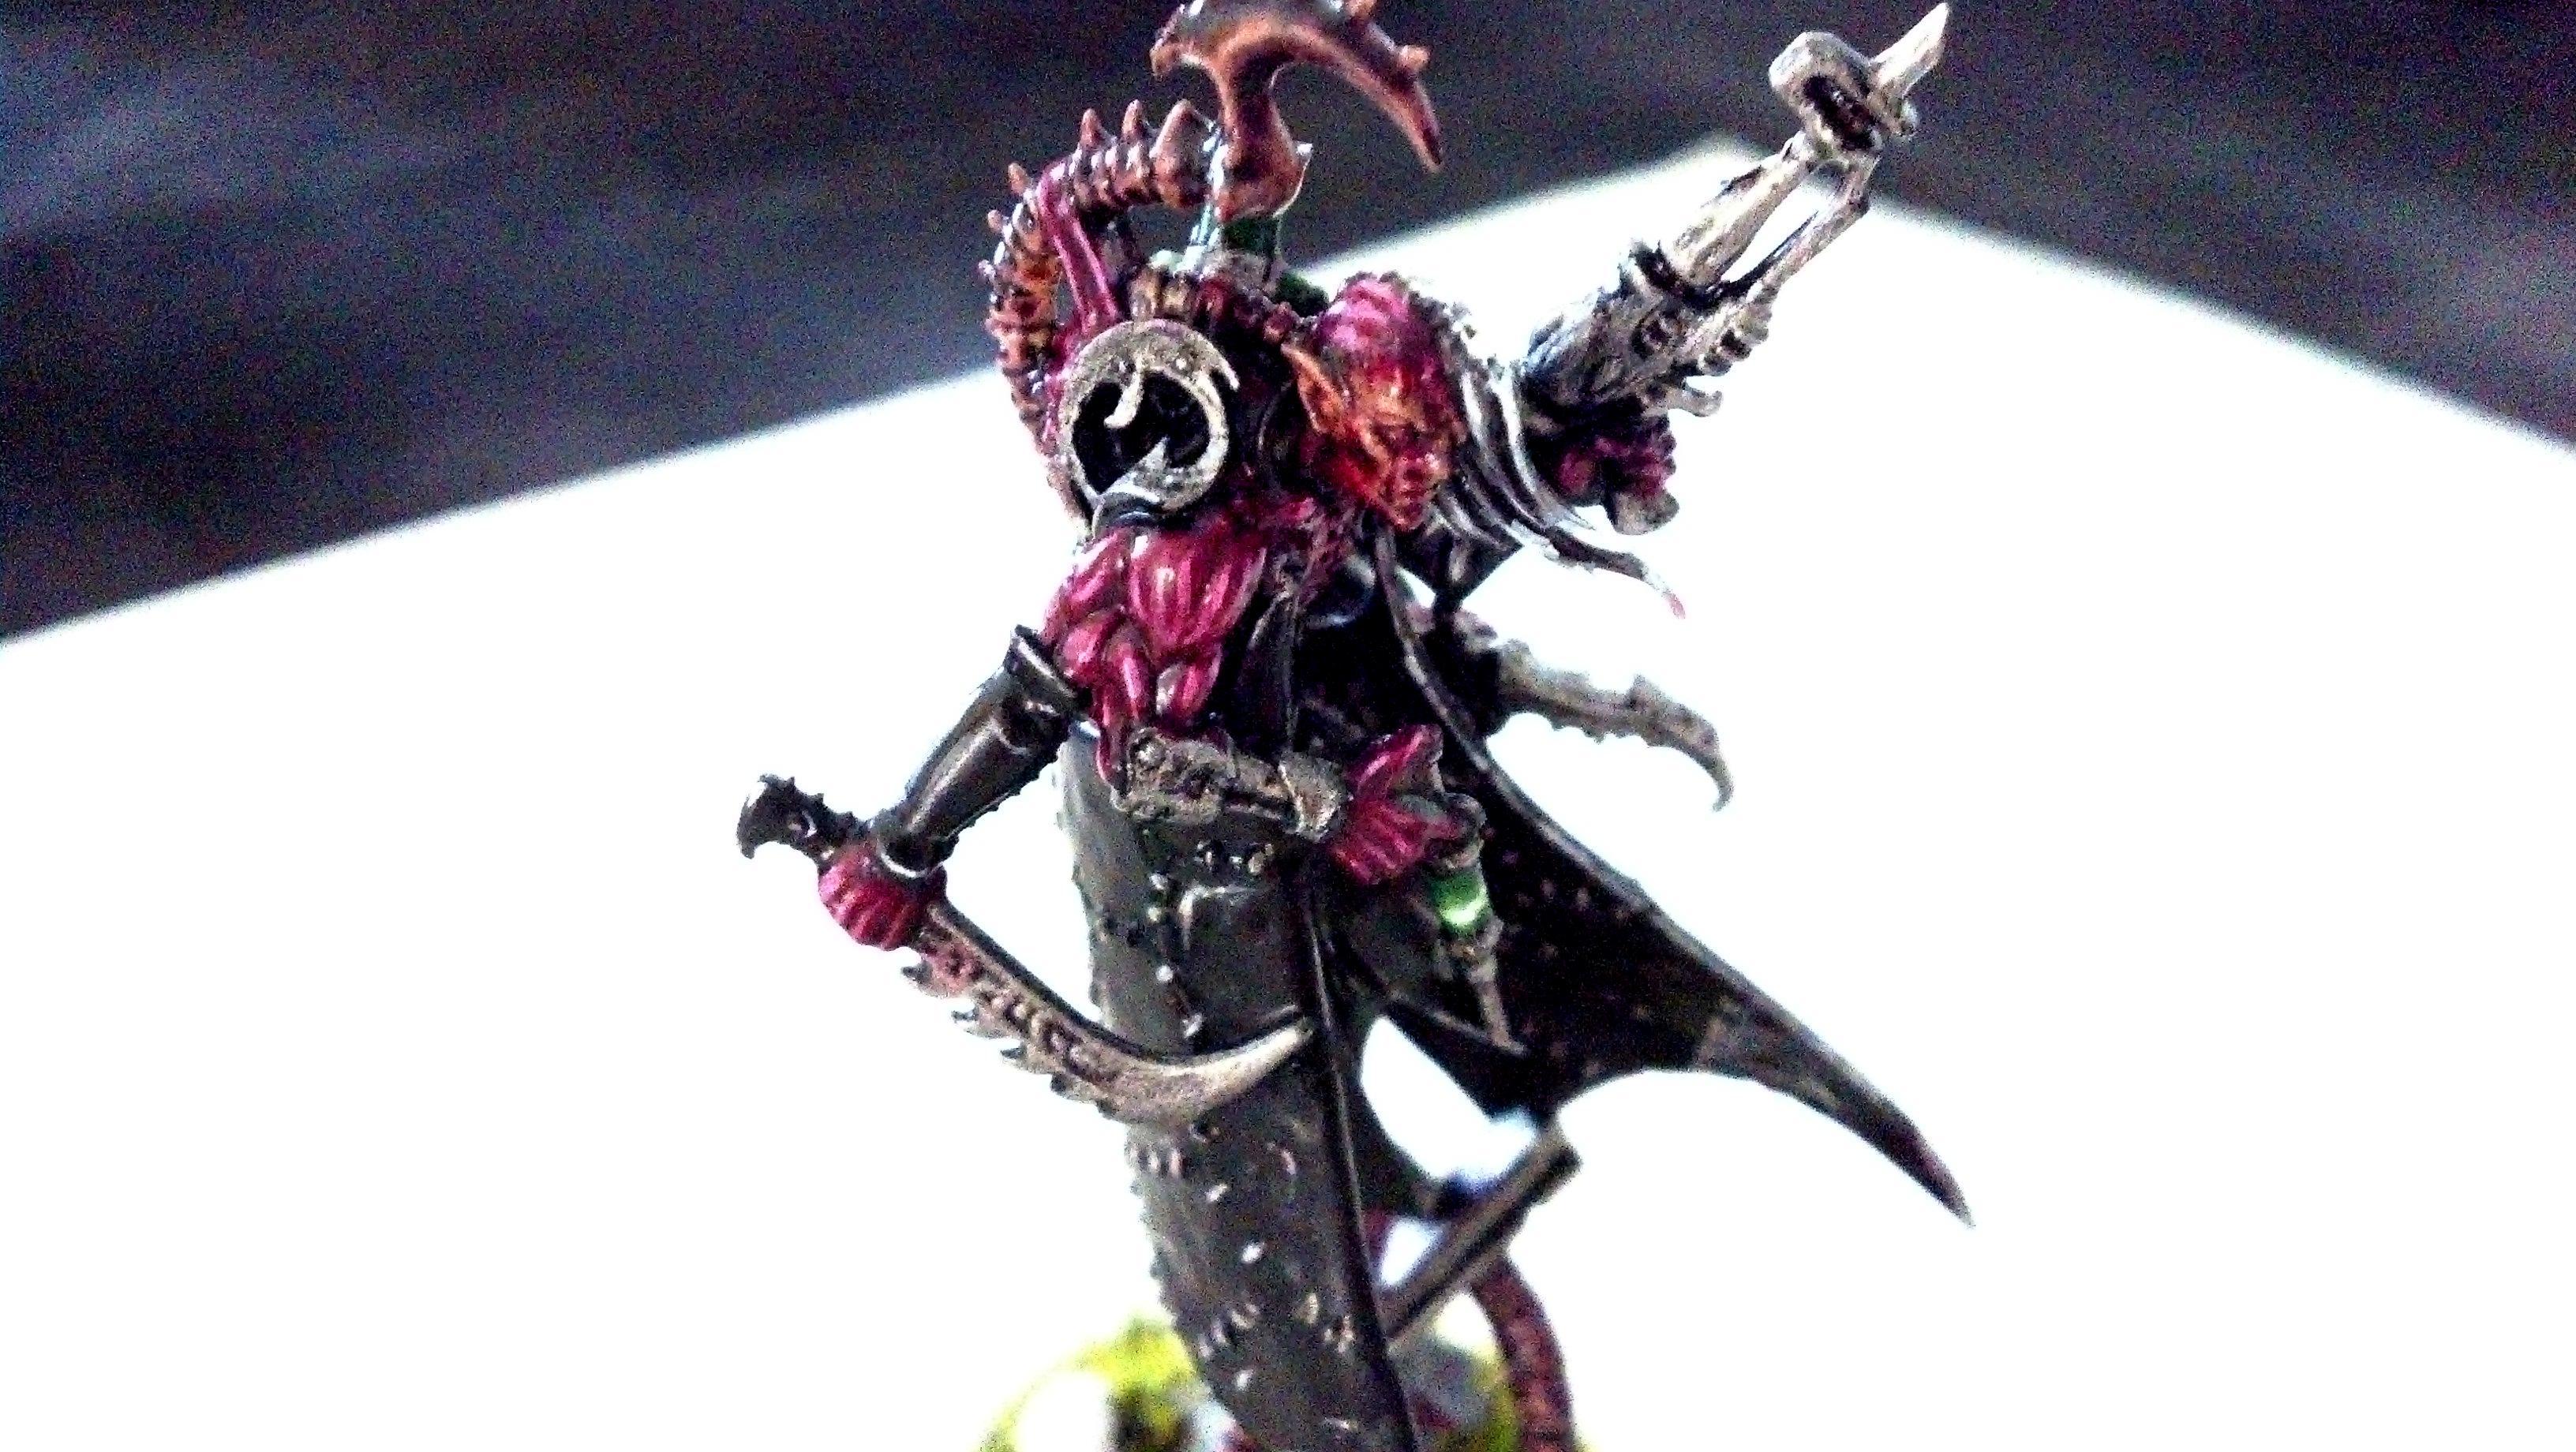 Agoniser, Alien, Ancient Evil, Anguish, Archon, Archon Drak, Archon Drak Synthrack, Bloody, Body, Casket Of Flensing, Cenobite, Cenobites, Chatterer, Ciratrix, Codex, Coven, Covenites, Covens, Dark, Dark Eldar Coven, Dark Eldar Haemonculus, Dark Eldar Urien Rakarth, Dead, Demented, Ecstasy, Eldar, Evil, Experiment, Flayed, Flayed Haemonculus, Flayed Skin, Flensing, Flesh, Fleshcorps, Gore, Gory, Grim Darkness, Grotesque, Grotesques, Haemonculi, Haemonculus, Haemonculus Covens, Haemonculus Valonian Ciratrix, Headquarters, Hellraiser, Horrors, Ichor Injector, Kabal, Kill, Killer, Masochism, Masochistic, Master, Modification, Of, Pain, Painted, Pinhead, Pleasure, Puzzle Box, Puzzlebox, Rakarth, Sadictic, Sadism, Sadistic, Scifi, Sculpted, Sculpting, Sculptor, Skin, Skinless, Slasher, Sorrow, Soulstorm, Supervillain, Terror, Torment, Torments, Torture, Urien, Urien Rakarth, Urien Rakarth Master Haemonculus, Urien Rakarth Model, Urien Rakarth Sculpotor Of Torments, Urien Rakarth Sculptor Of Torments, Valonian, Vile, Warhammer 40,000, Warhammer Fantasy, Warriors, Wrack, Wracks